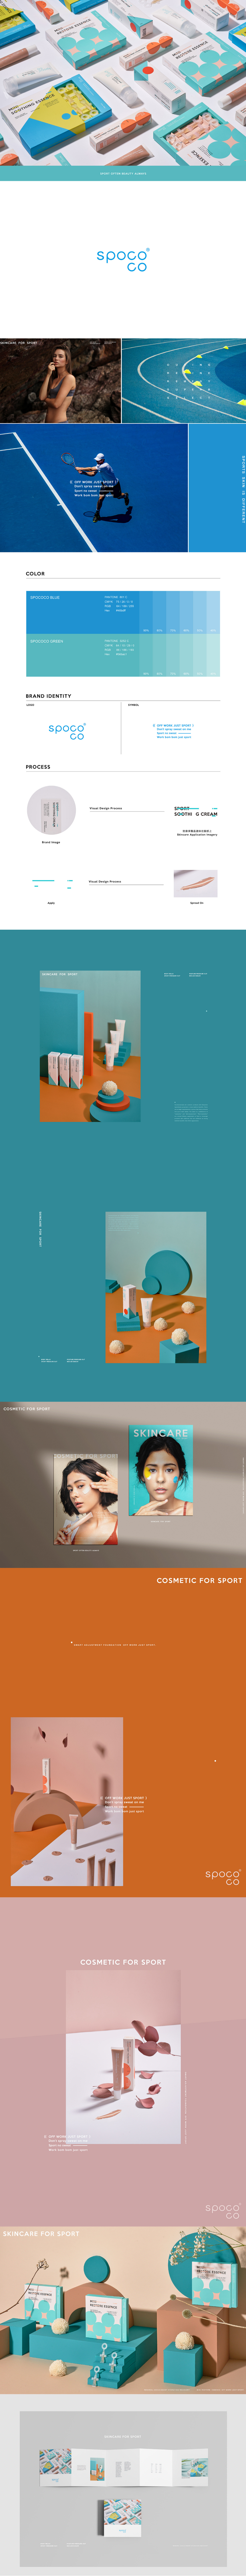 Graphic Design,Photography,Branding